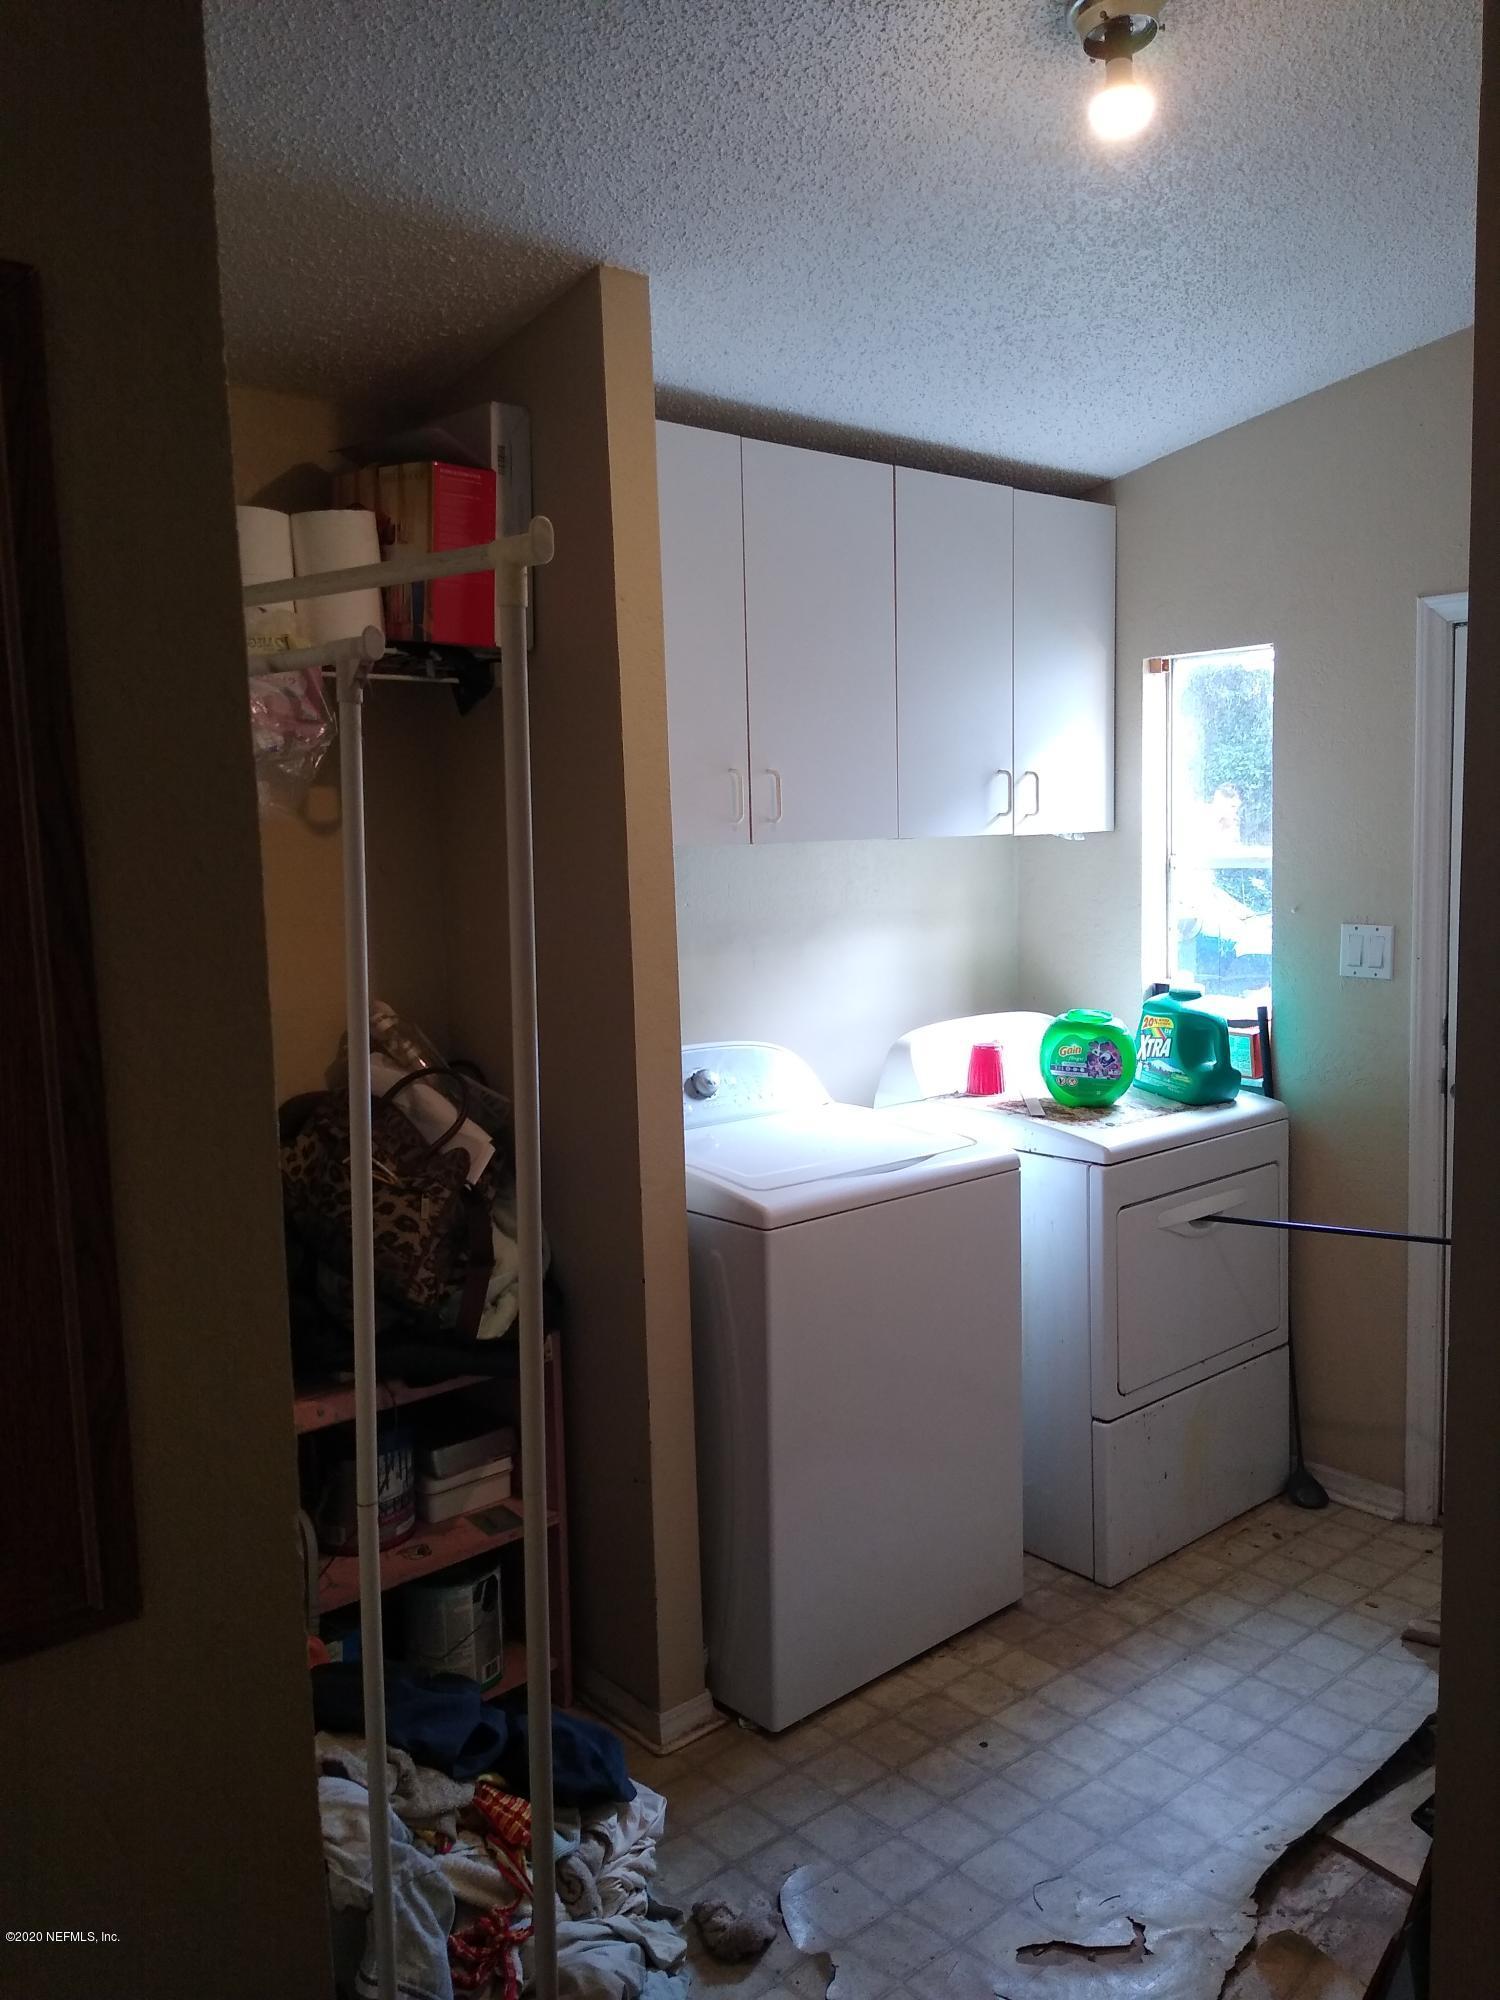 109 BATES LANE, ELKTON, FLORIDA 32033, 3 Bedrooms Bedrooms, ,2 BathroomsBathrooms,Residential,For sale,BATES LANE,1058938